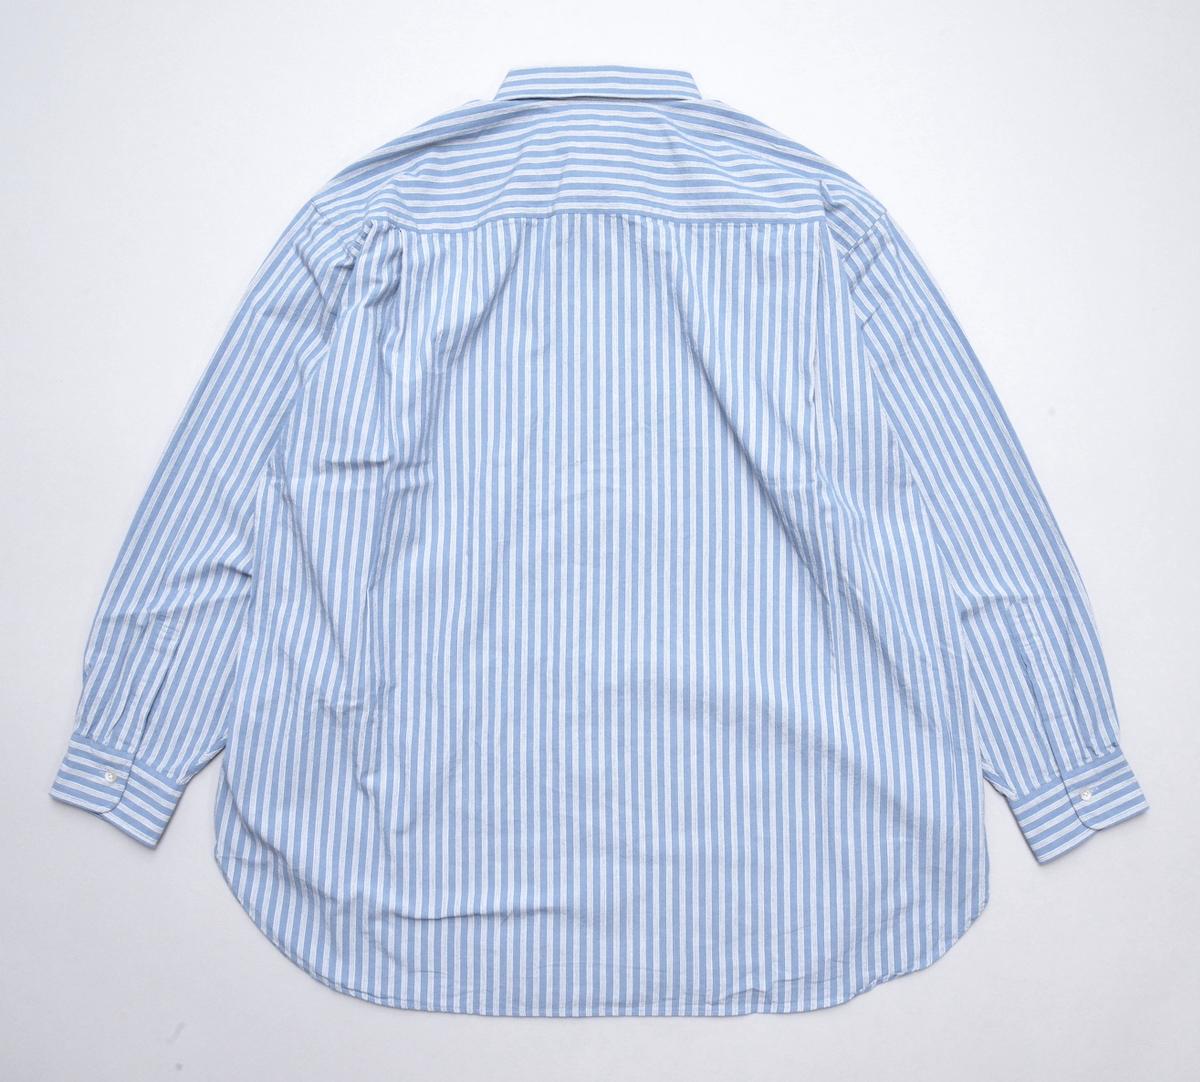 Marvine Pontiak shirt makers 「 Italian Collar SH / Blue ST 」